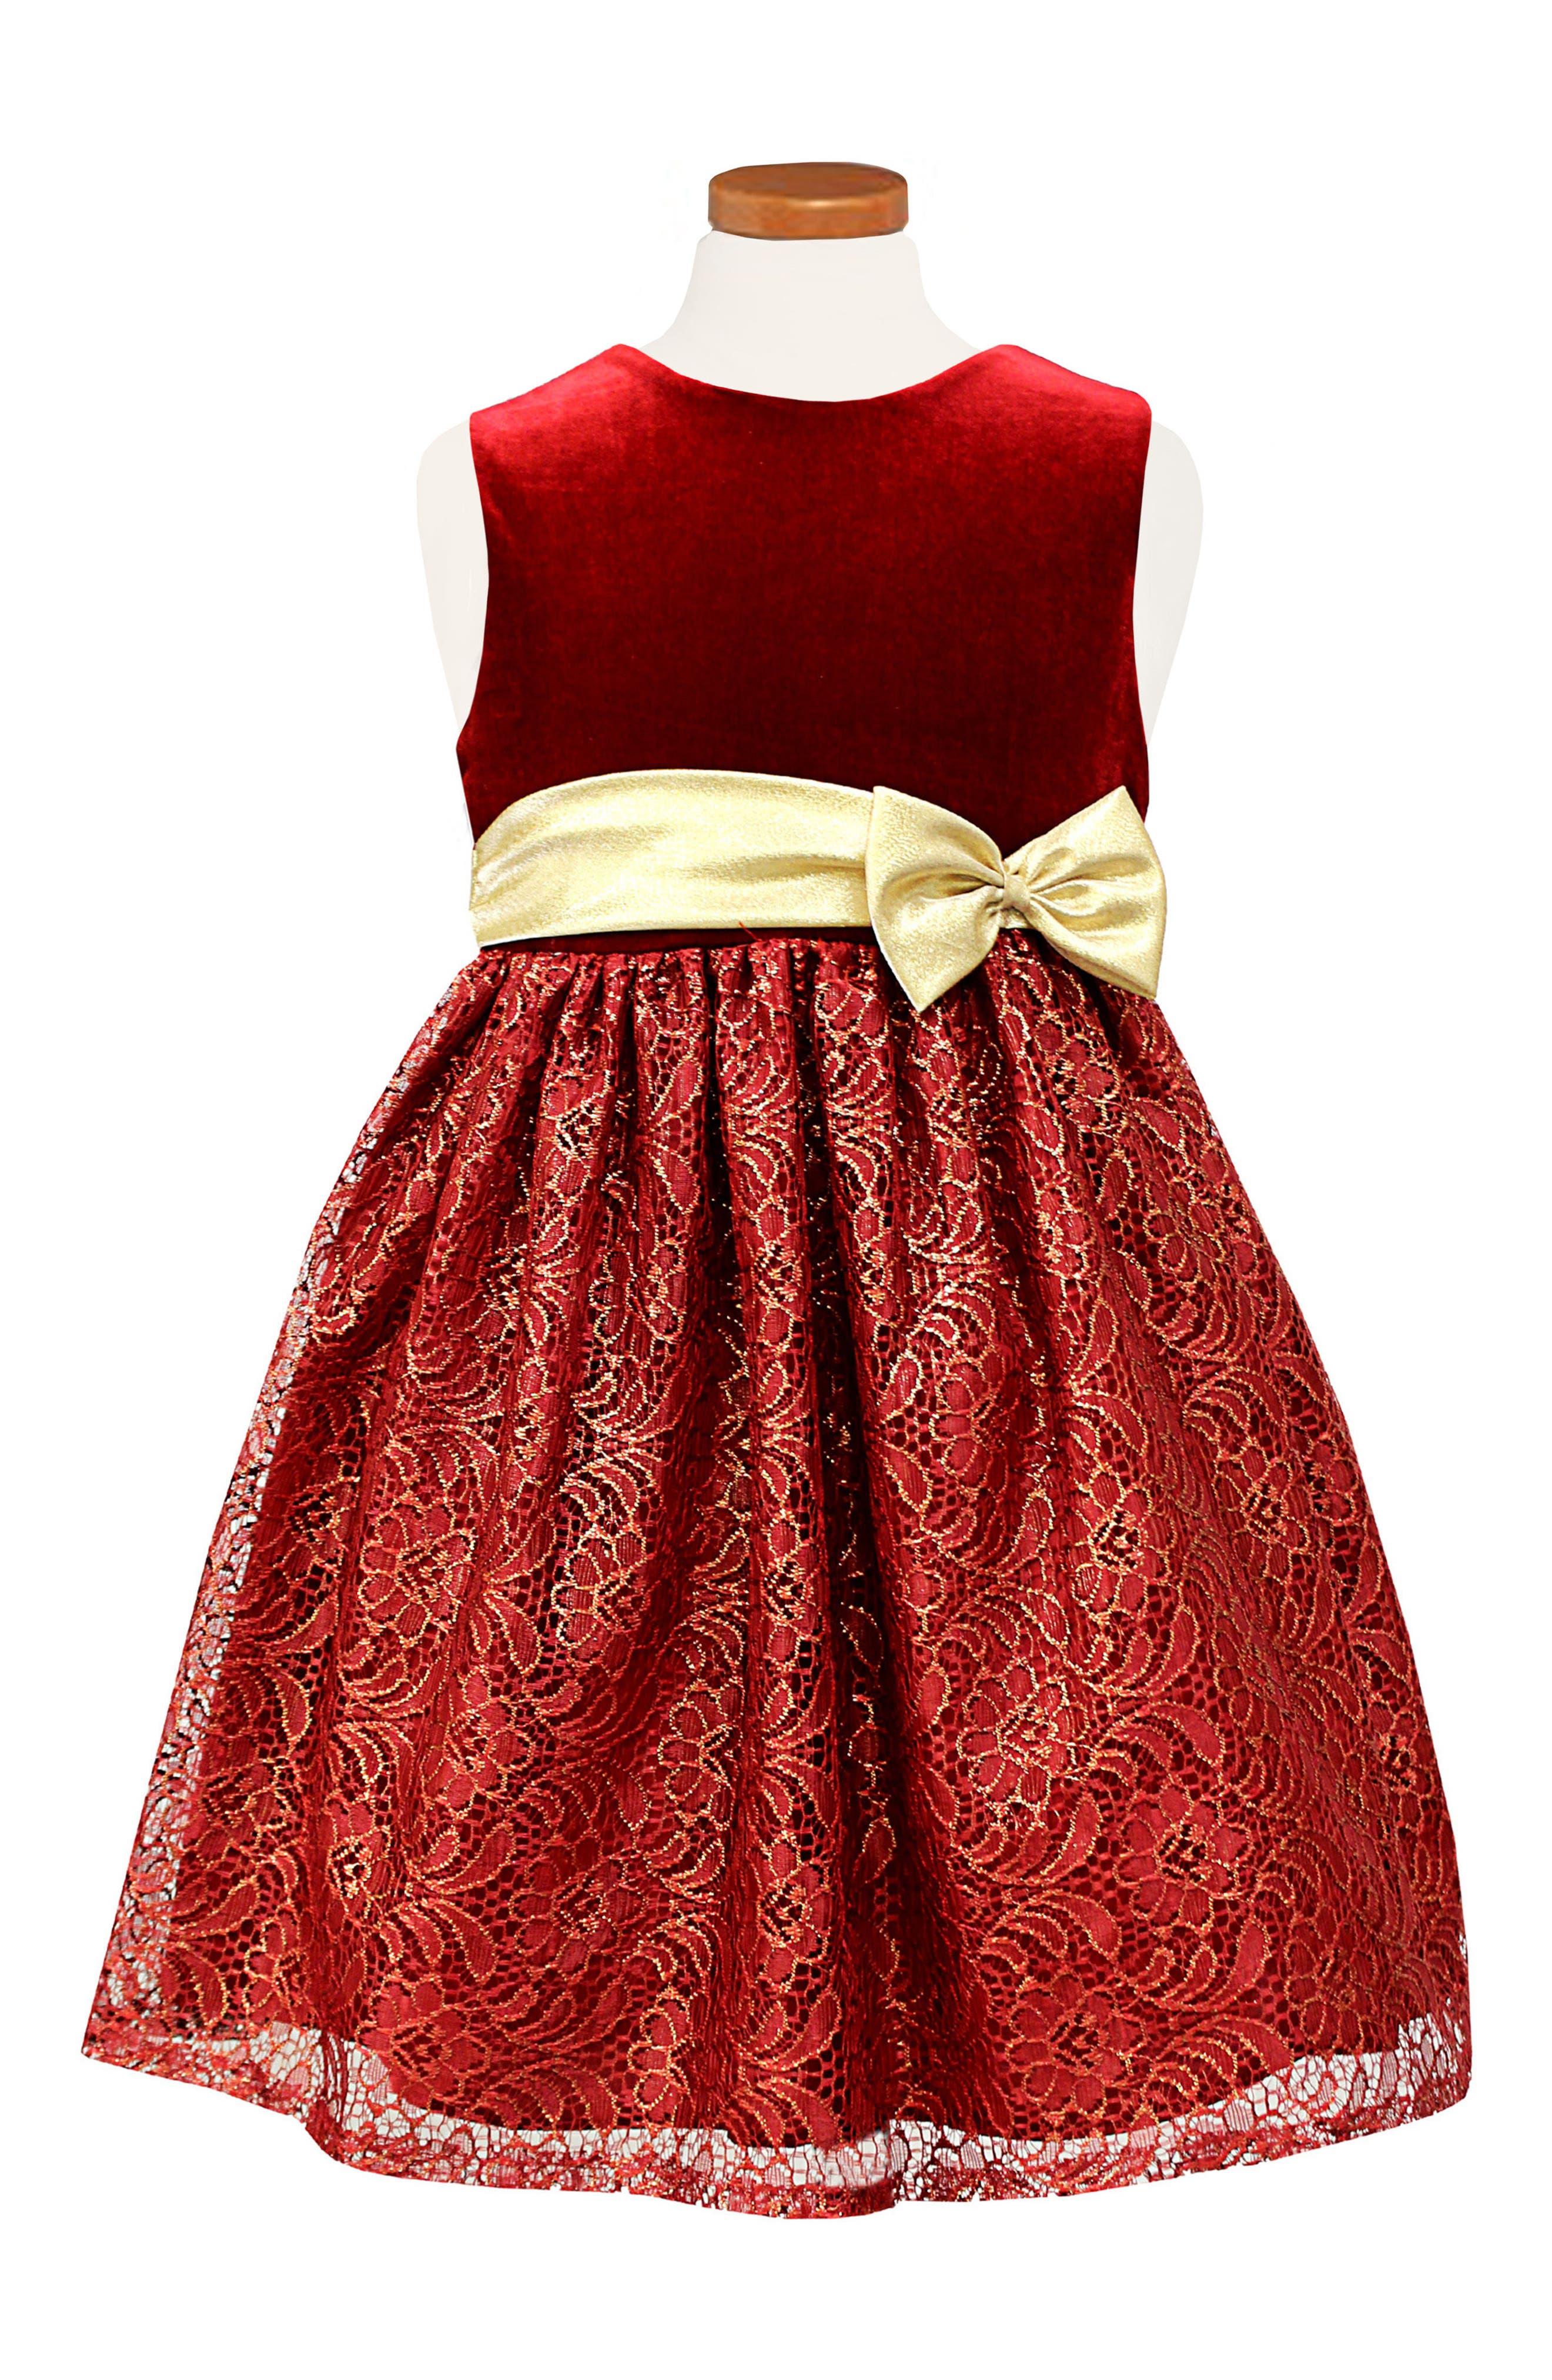 Velvet & Lace Party Dress,                             Main thumbnail 1, color,                             Red